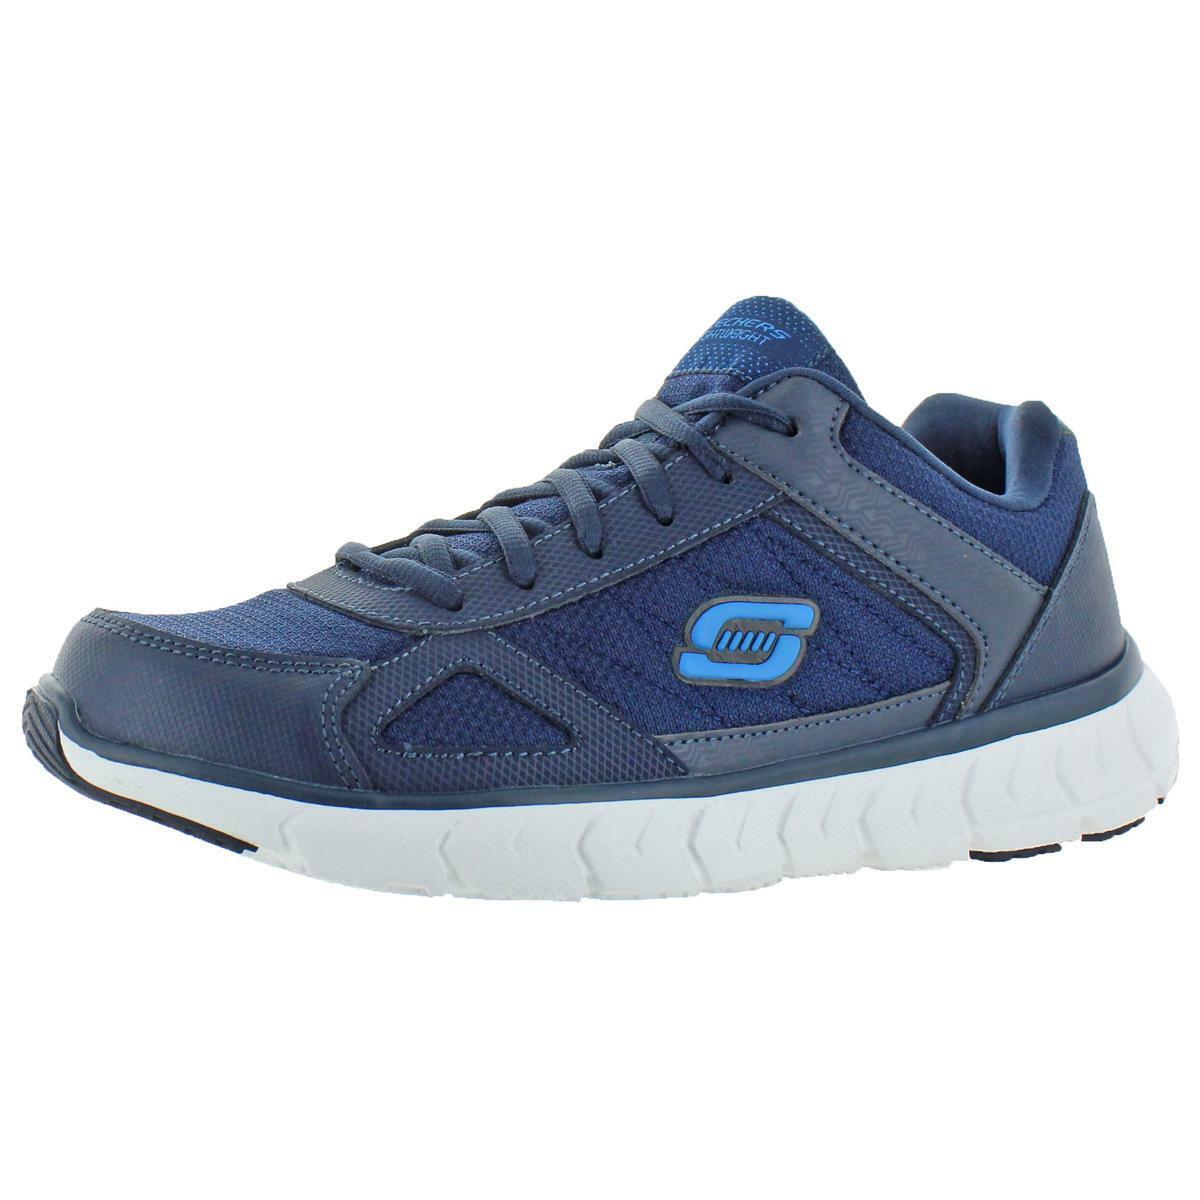 Skechers Mens Soleus-Distort Leather Trainer Walking shoes Sneakers BHFO 0929